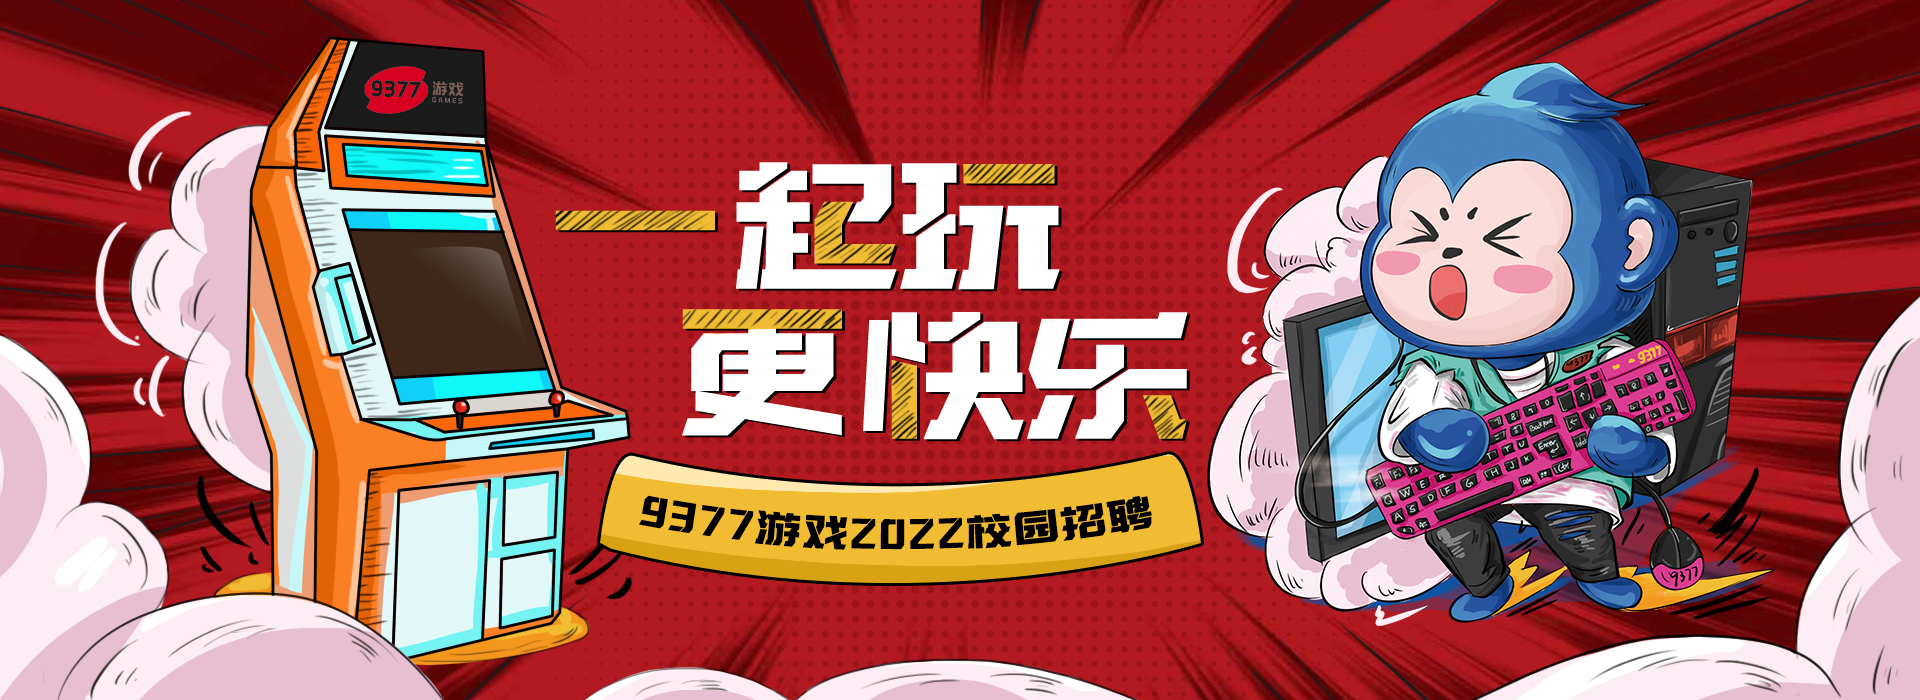 校招banner.jpg